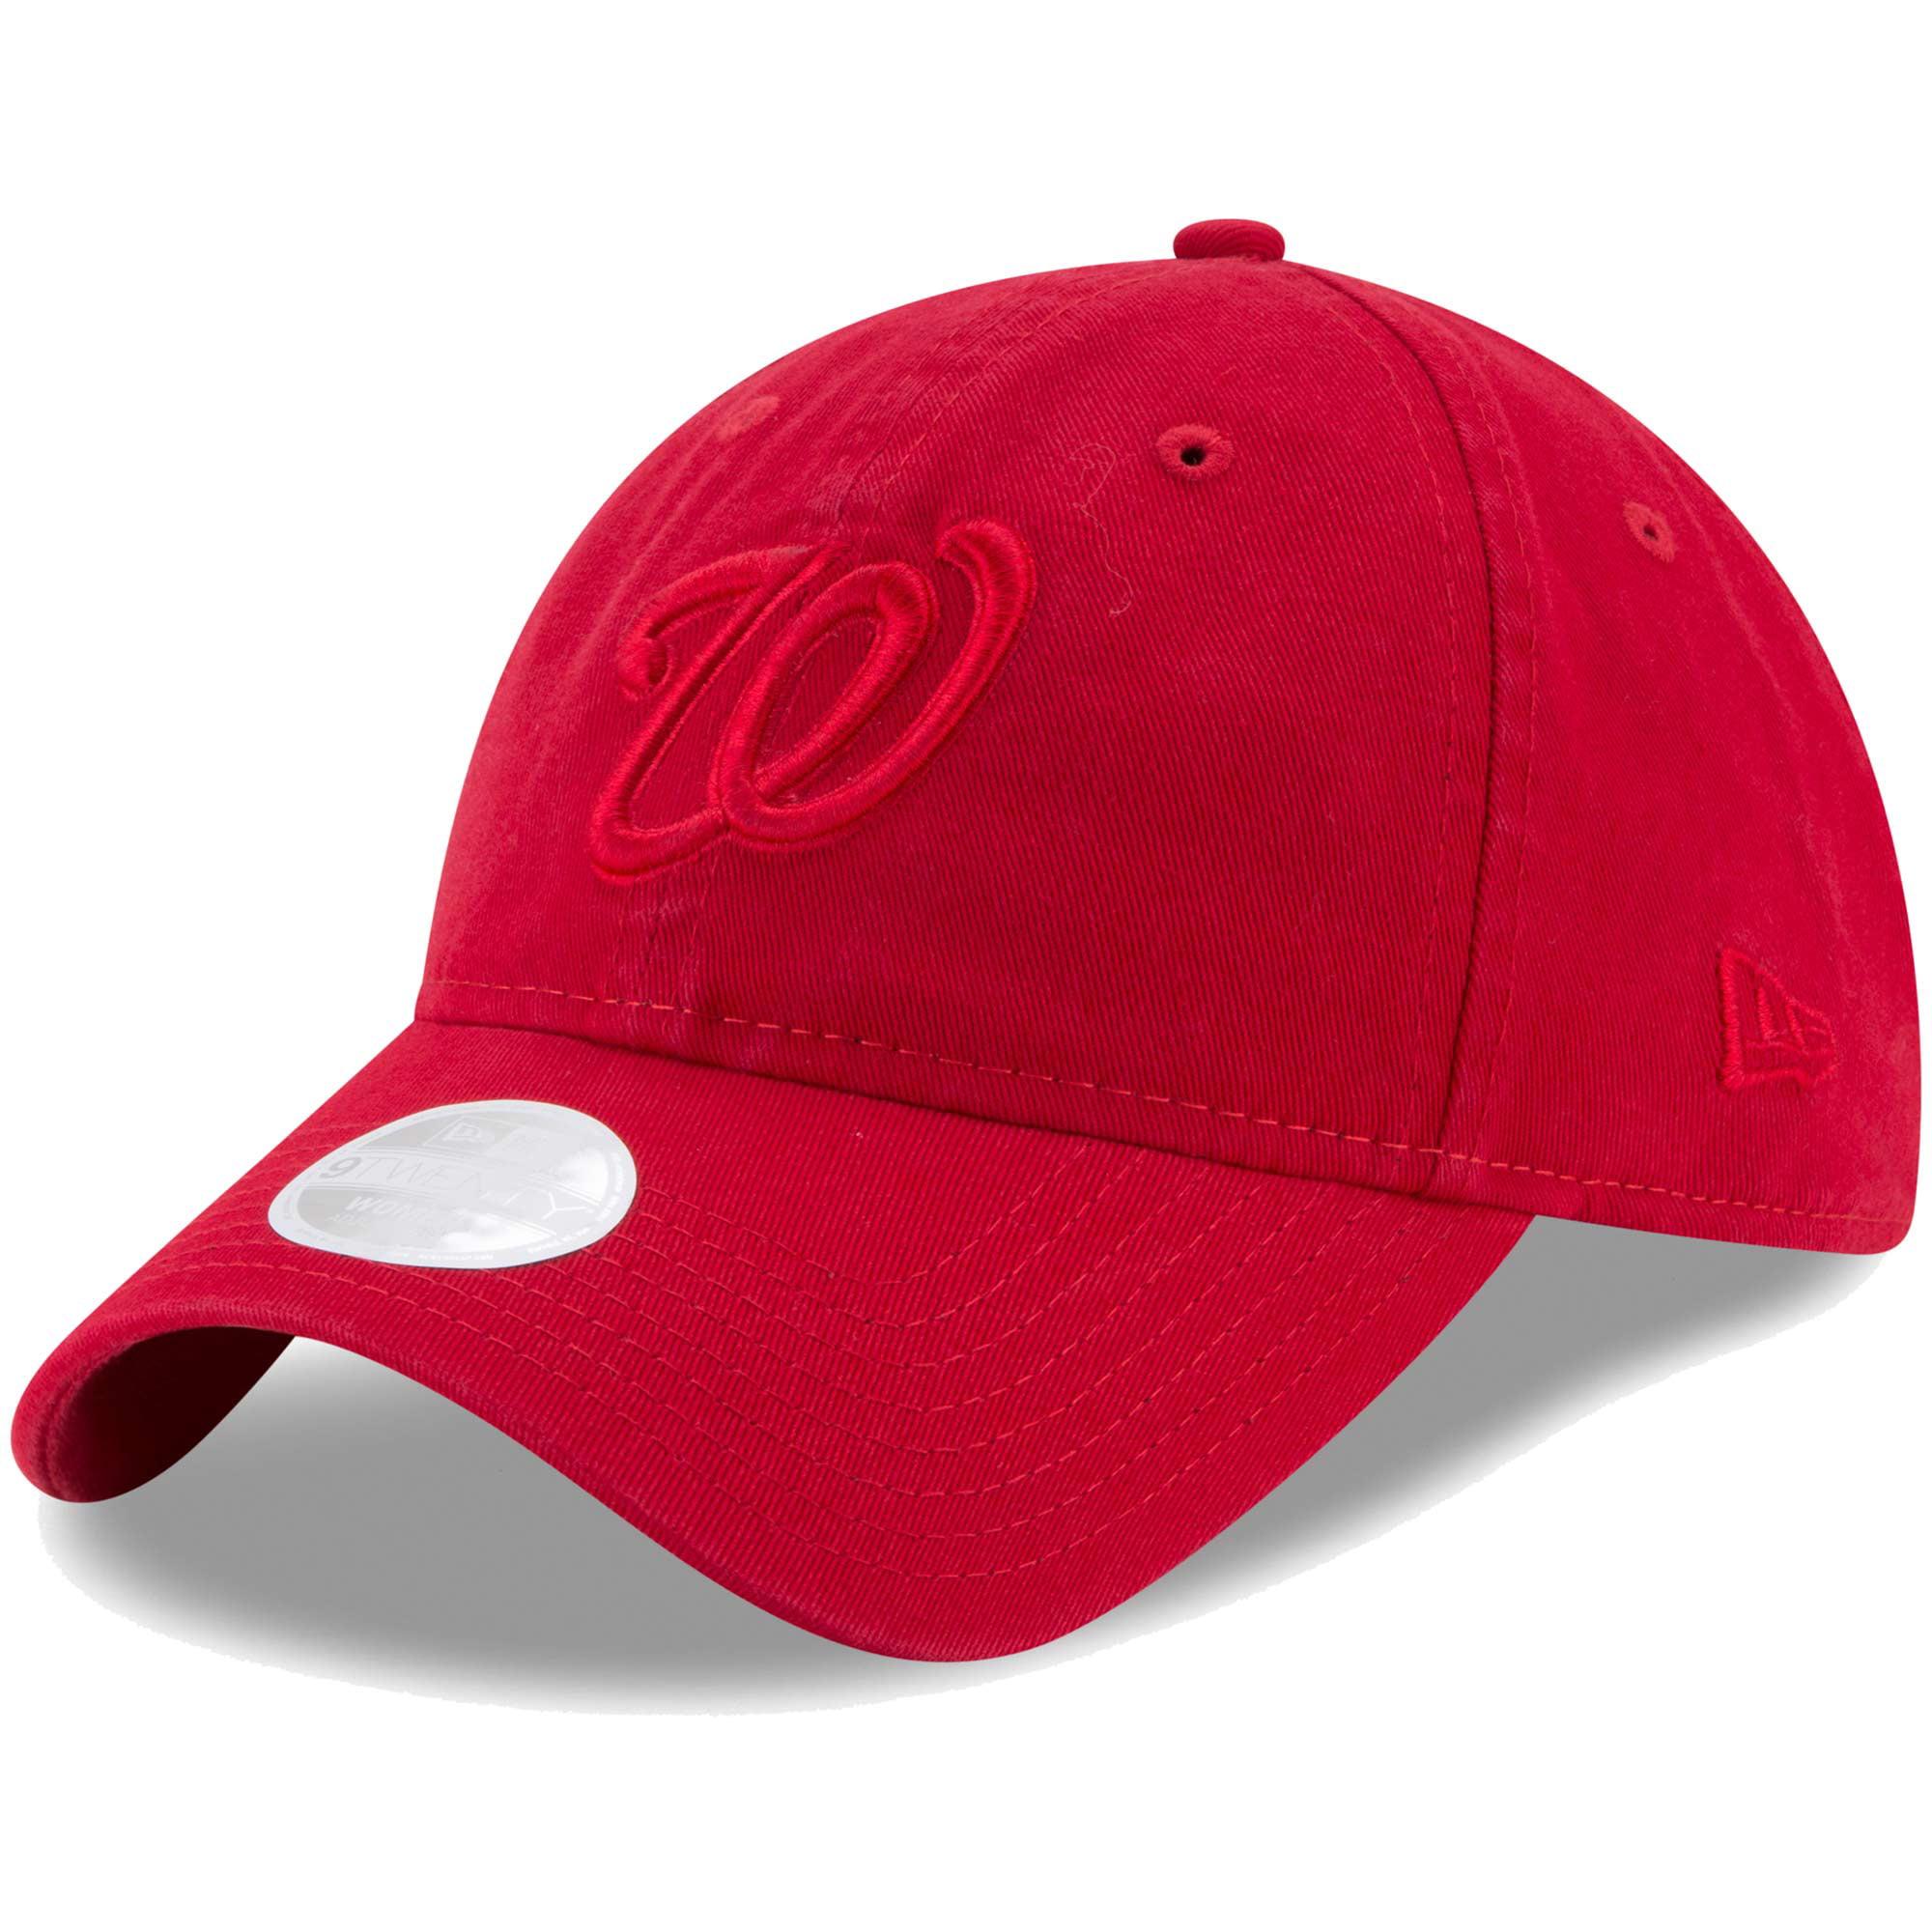 Washington Nationals New Era Women's Preferred Pick Tonal 9TWENTY Adjustable Hat - Red - OSFA